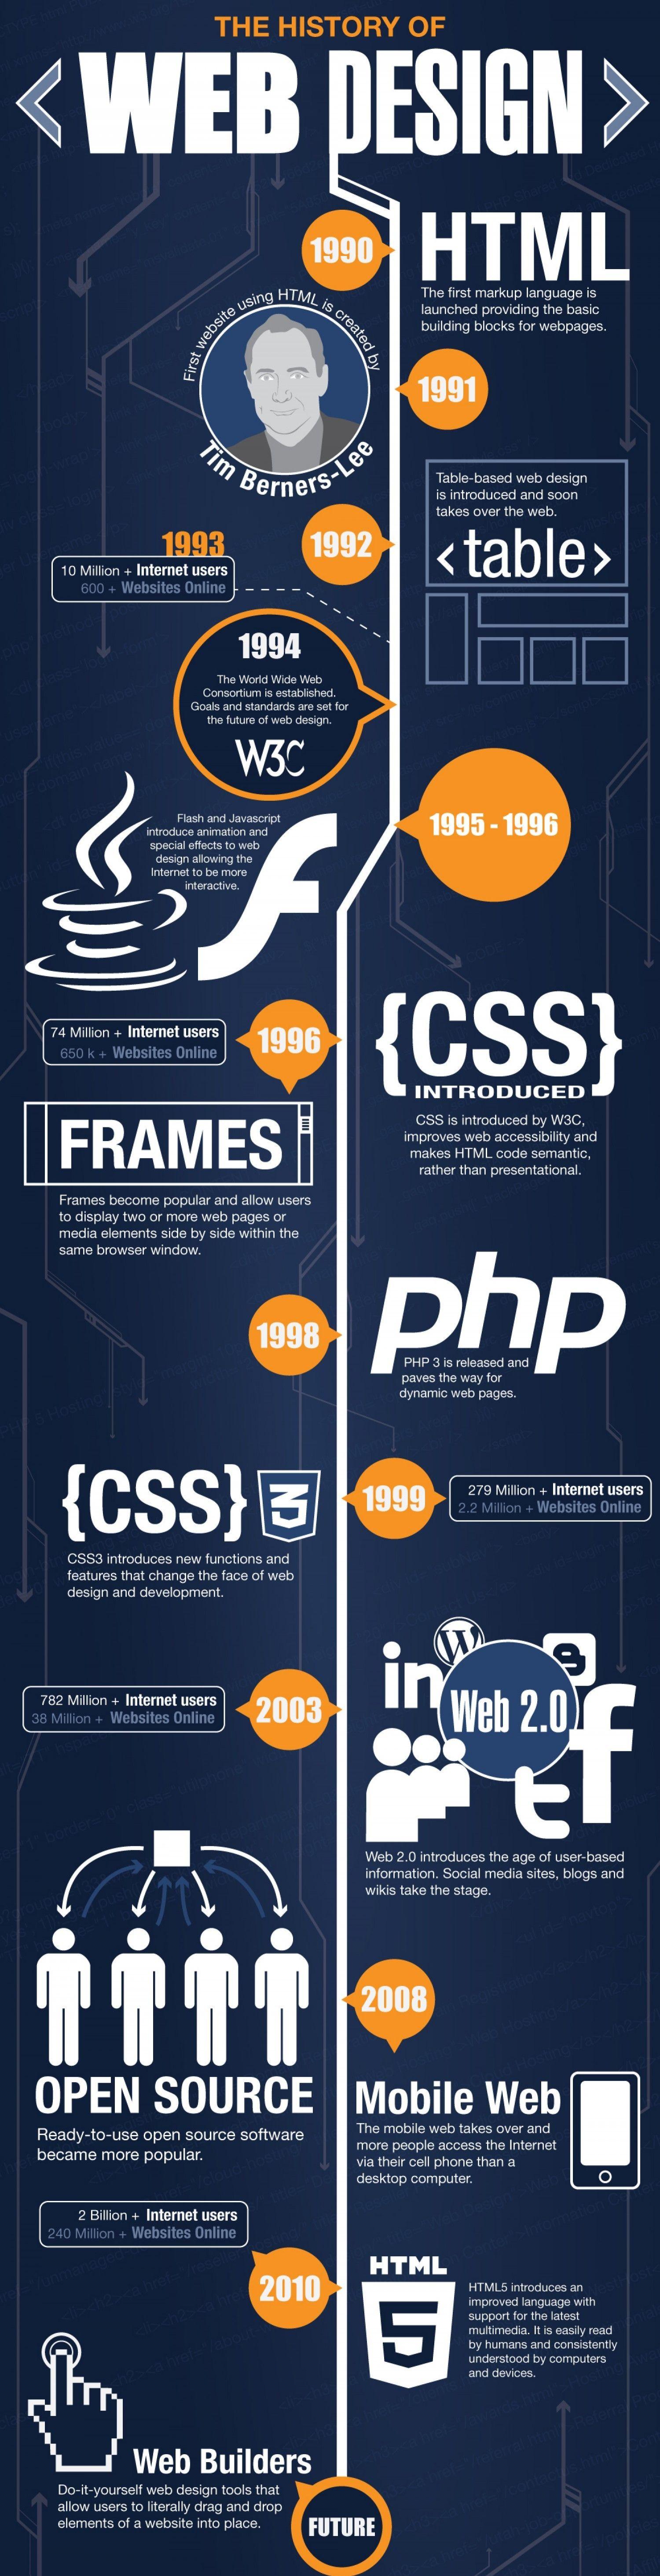 History About Web Design Tendencias De Web Design Inspiracao Web Design Ideias Curriculos